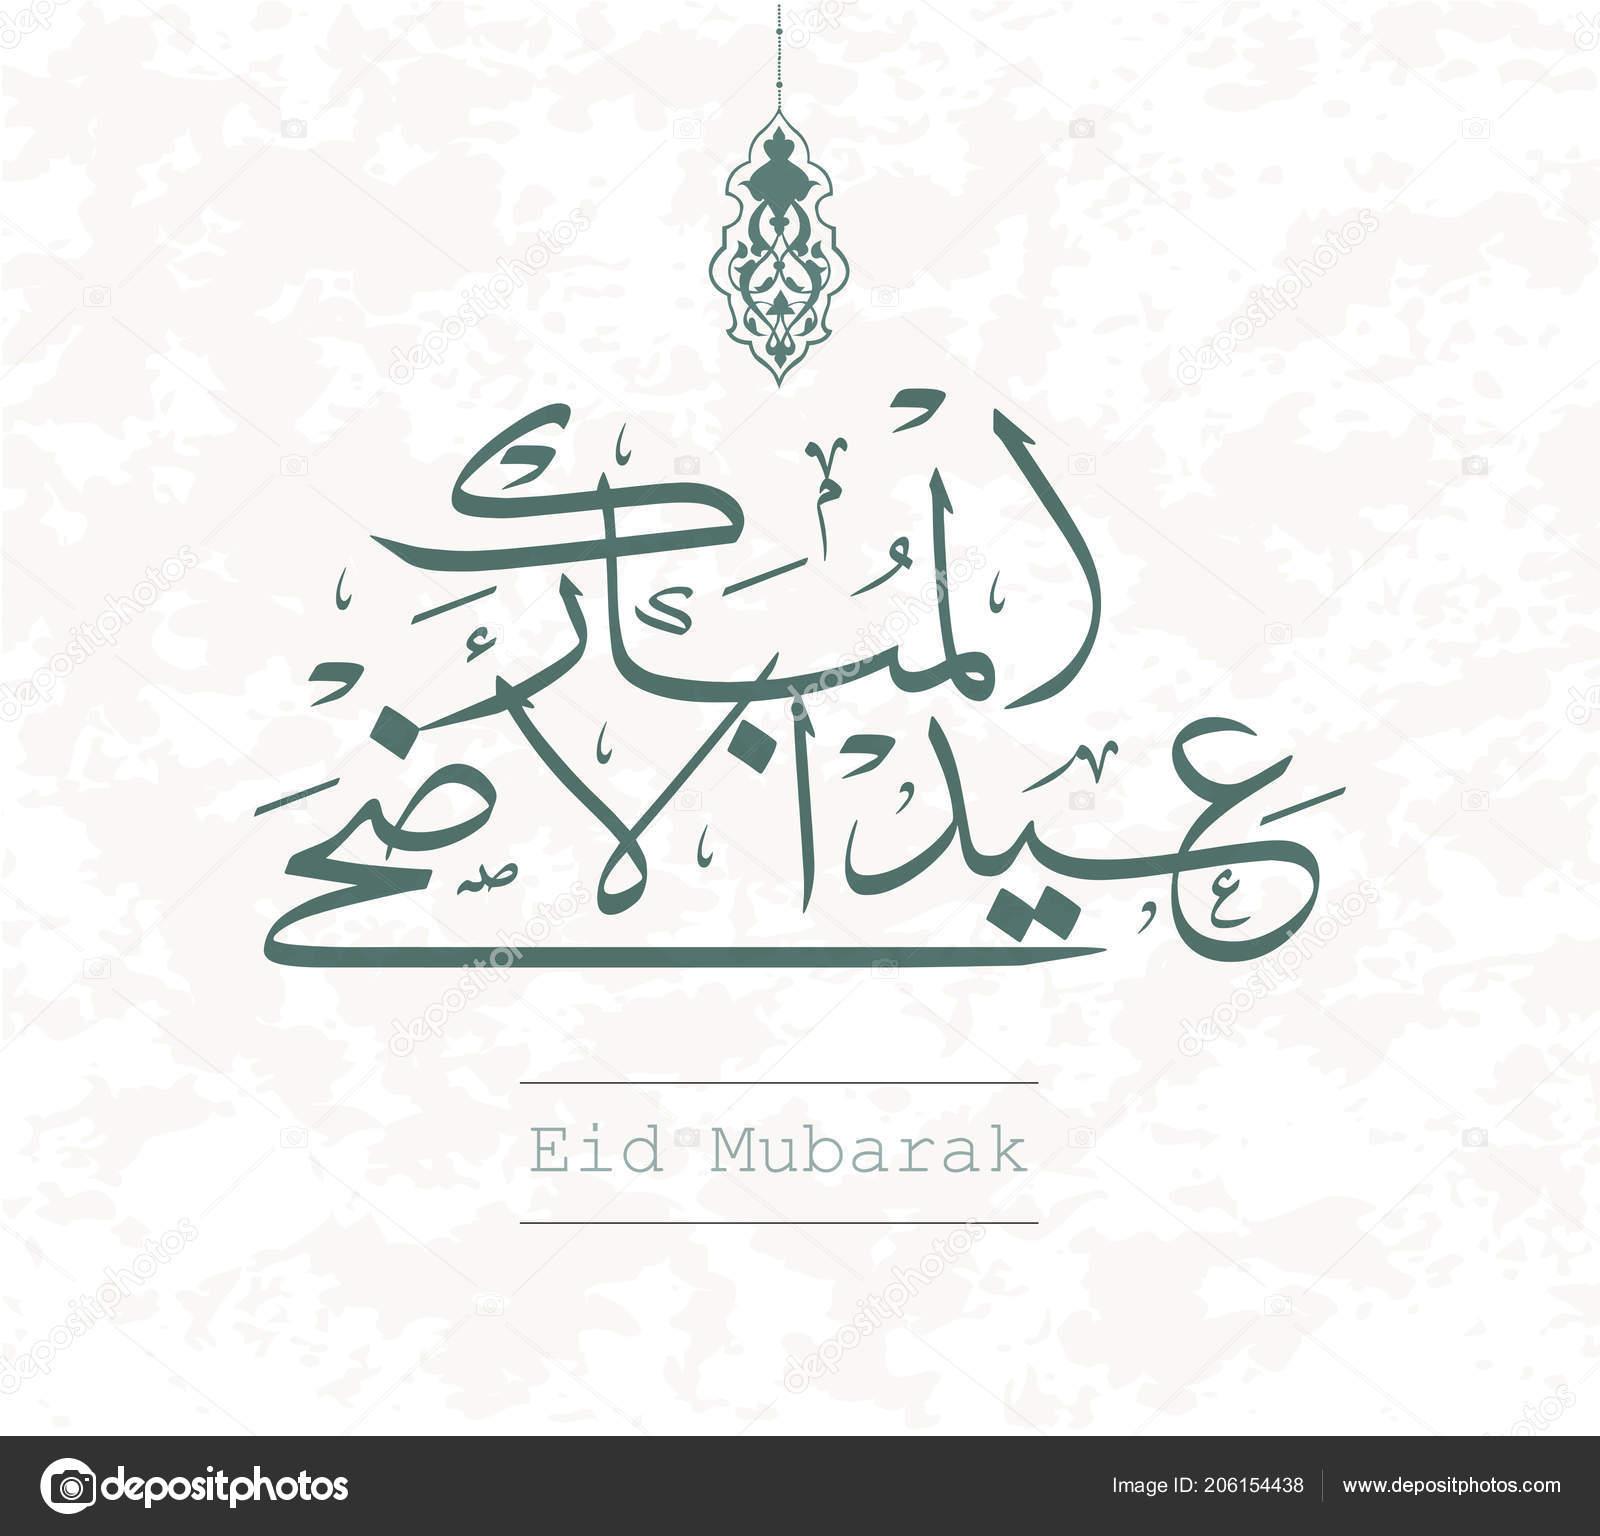 Eid Mubarak Arabic Calligraphy Eid Means Celebration Mubarak Means